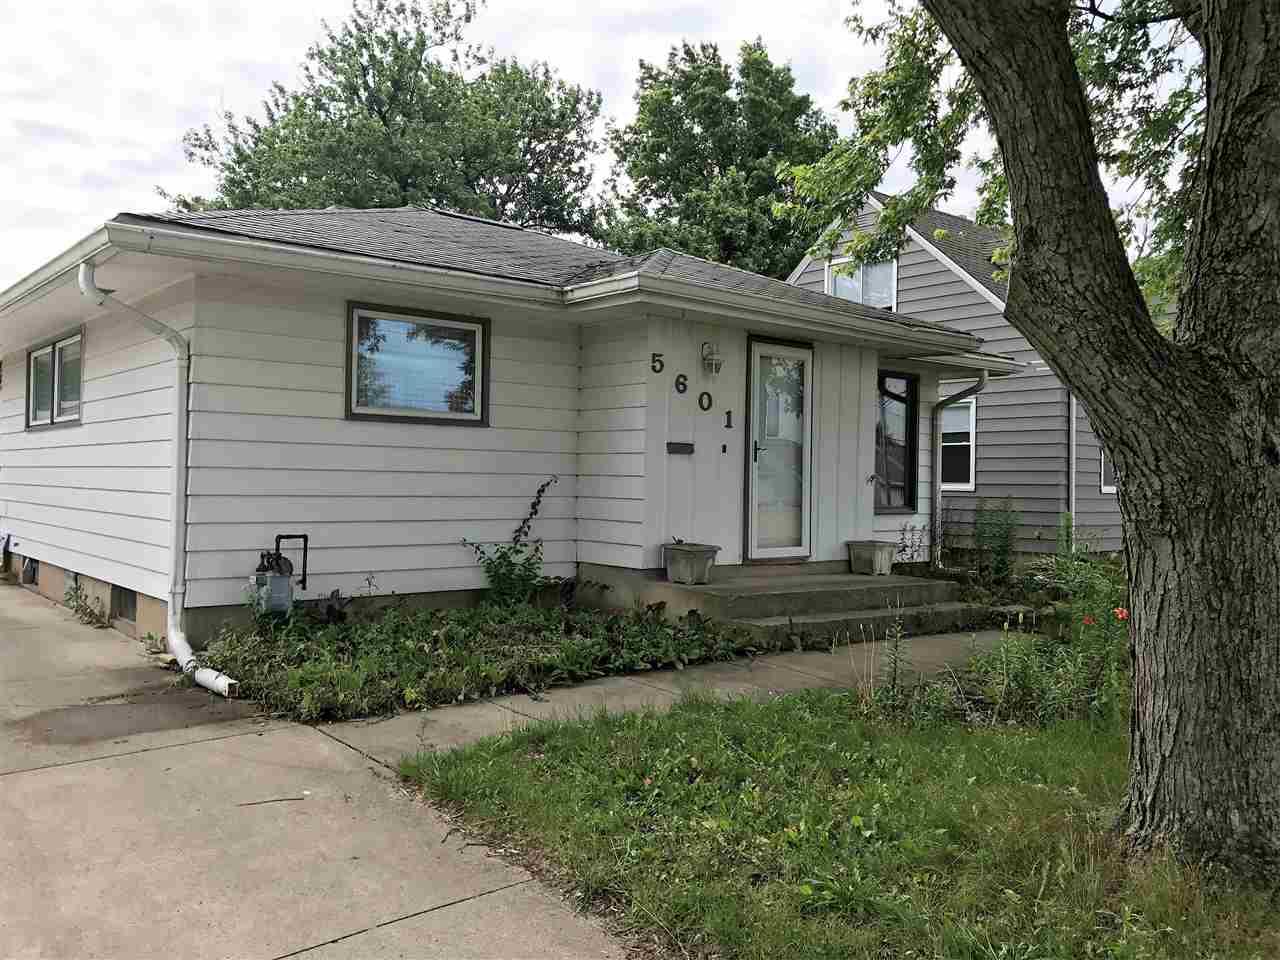 5601 Fairfield, Fort Wayne, IN 46807